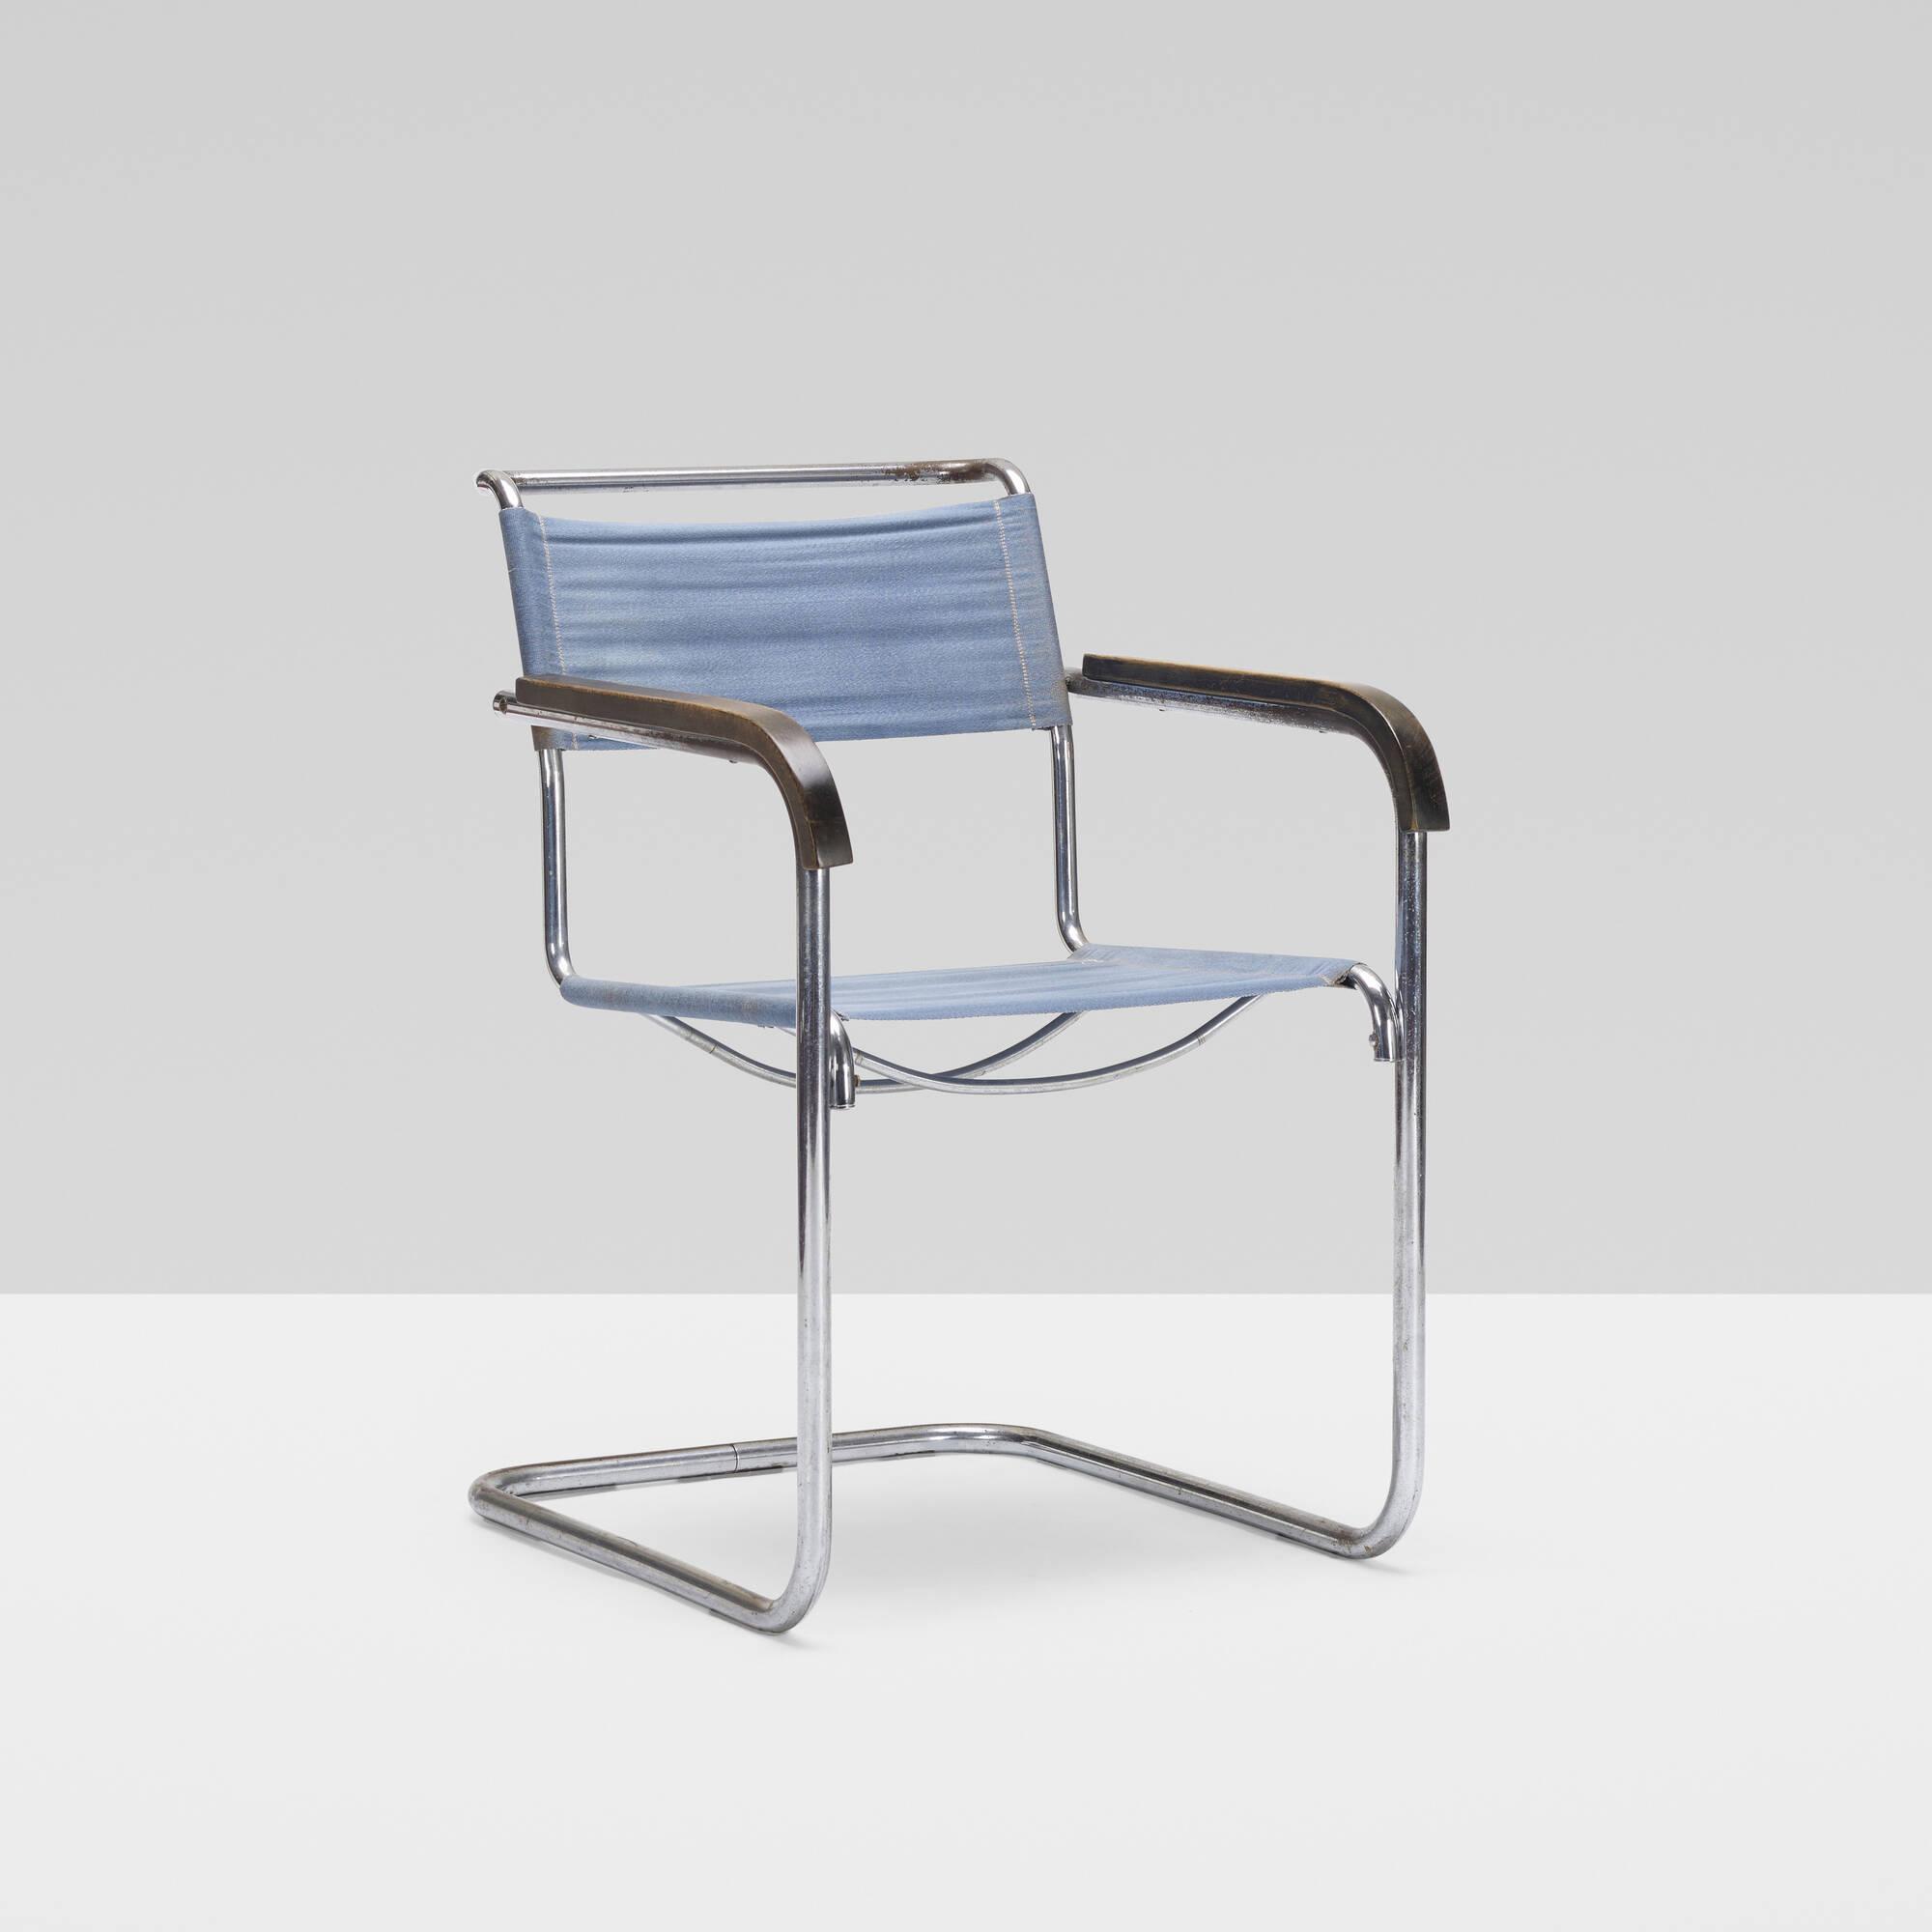 149: Marcel Breuer / armchair, model B32 (2 of 4)